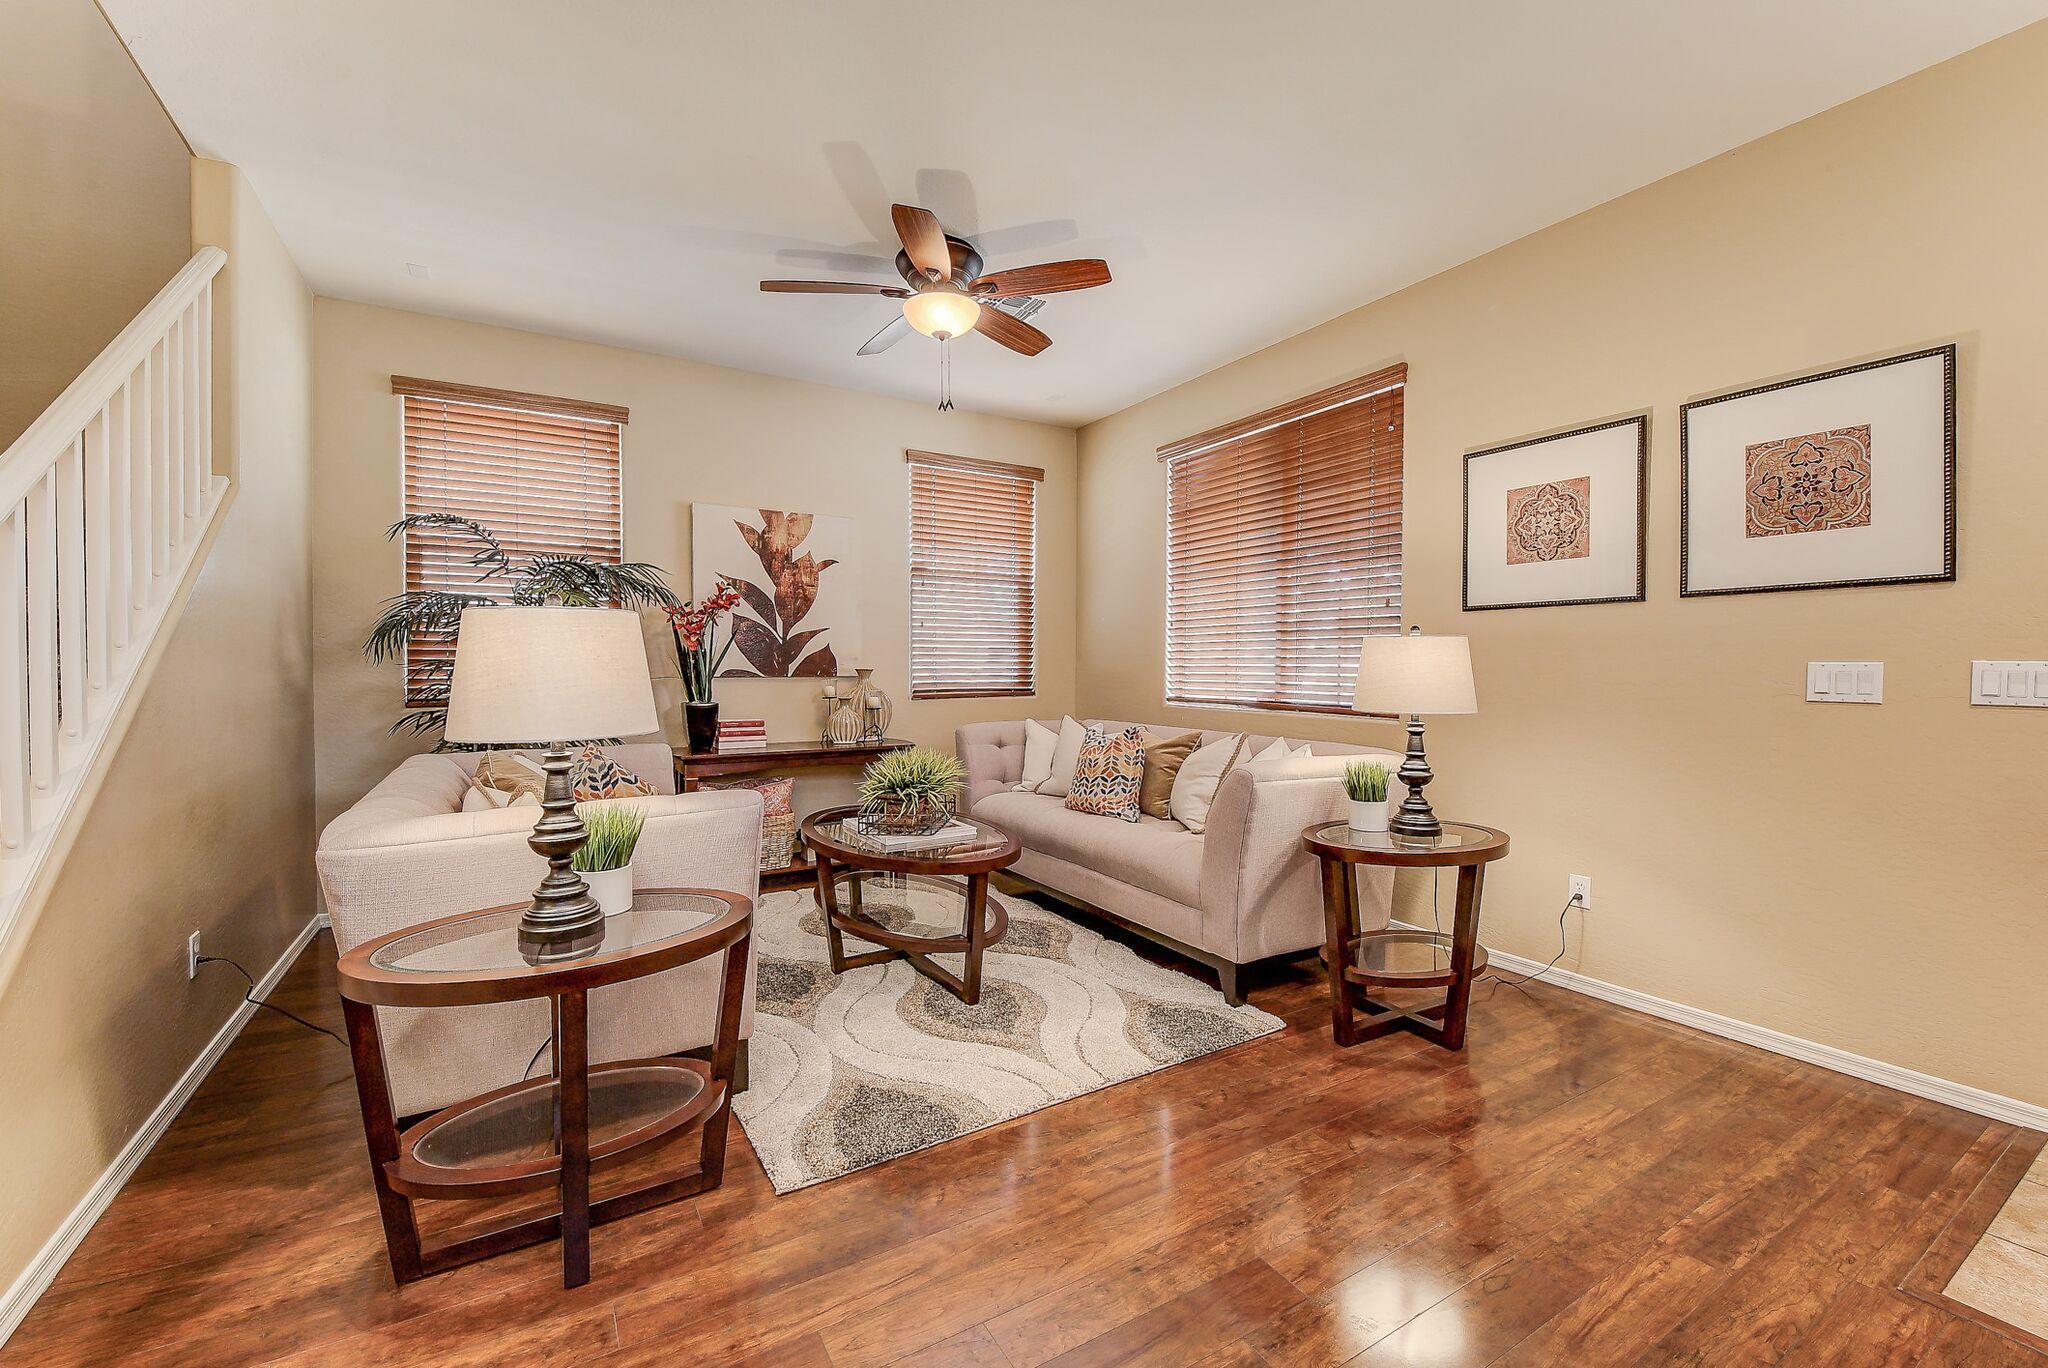 A-Living Room2.jpeg